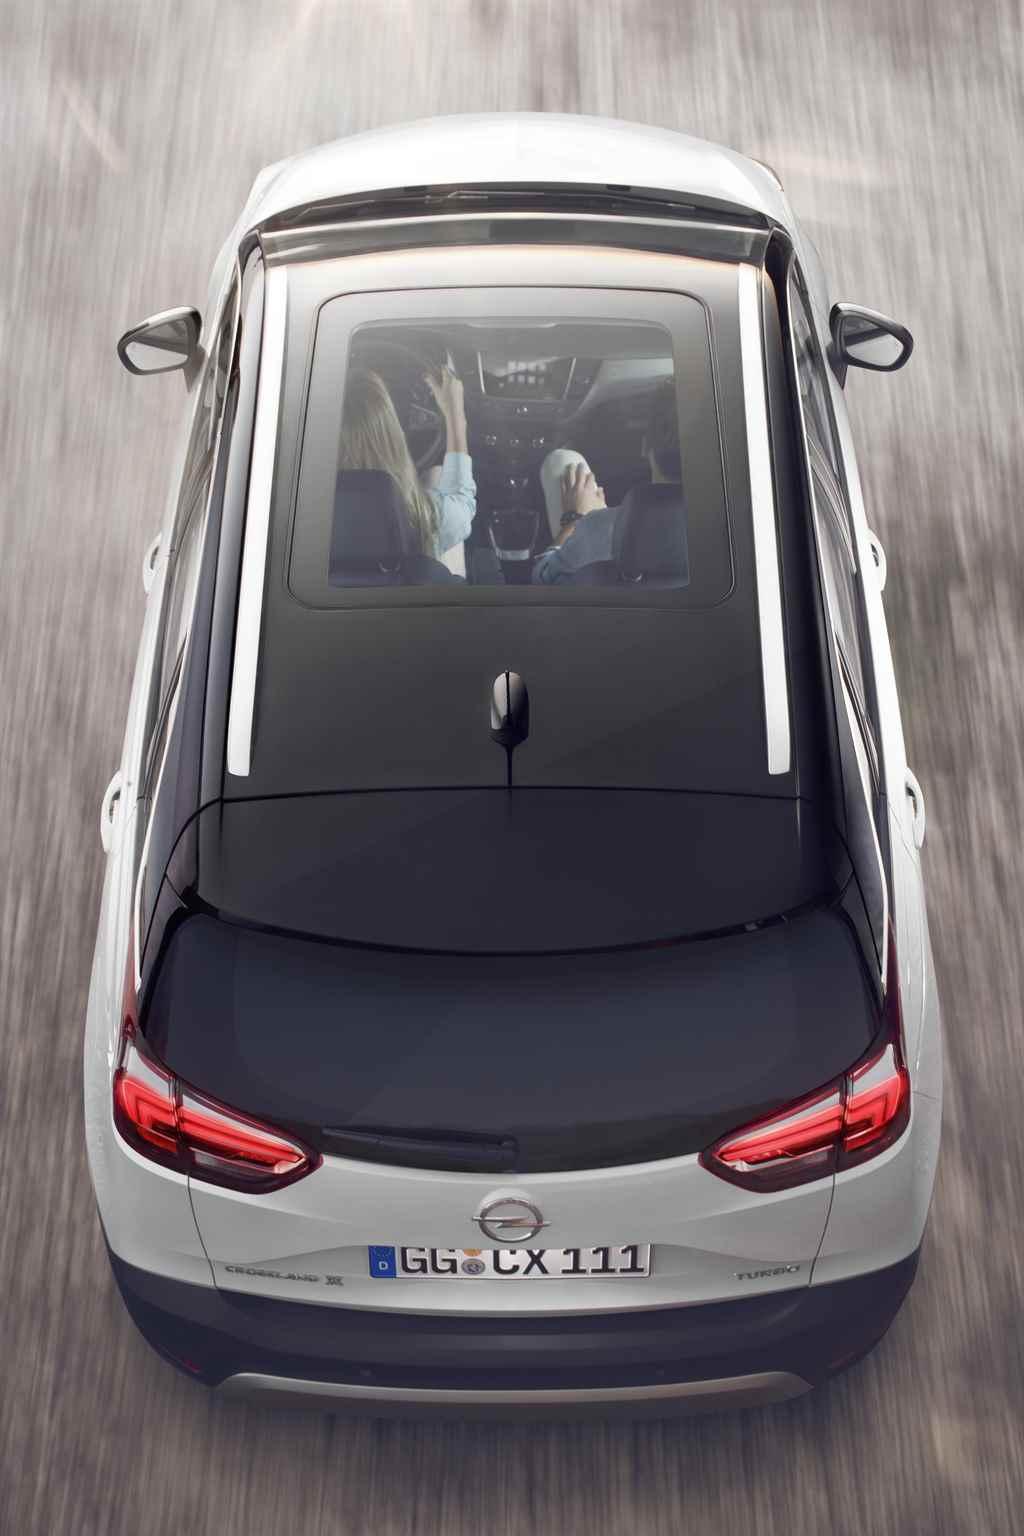 opel-crossland-x-2017-autoaddikt-4